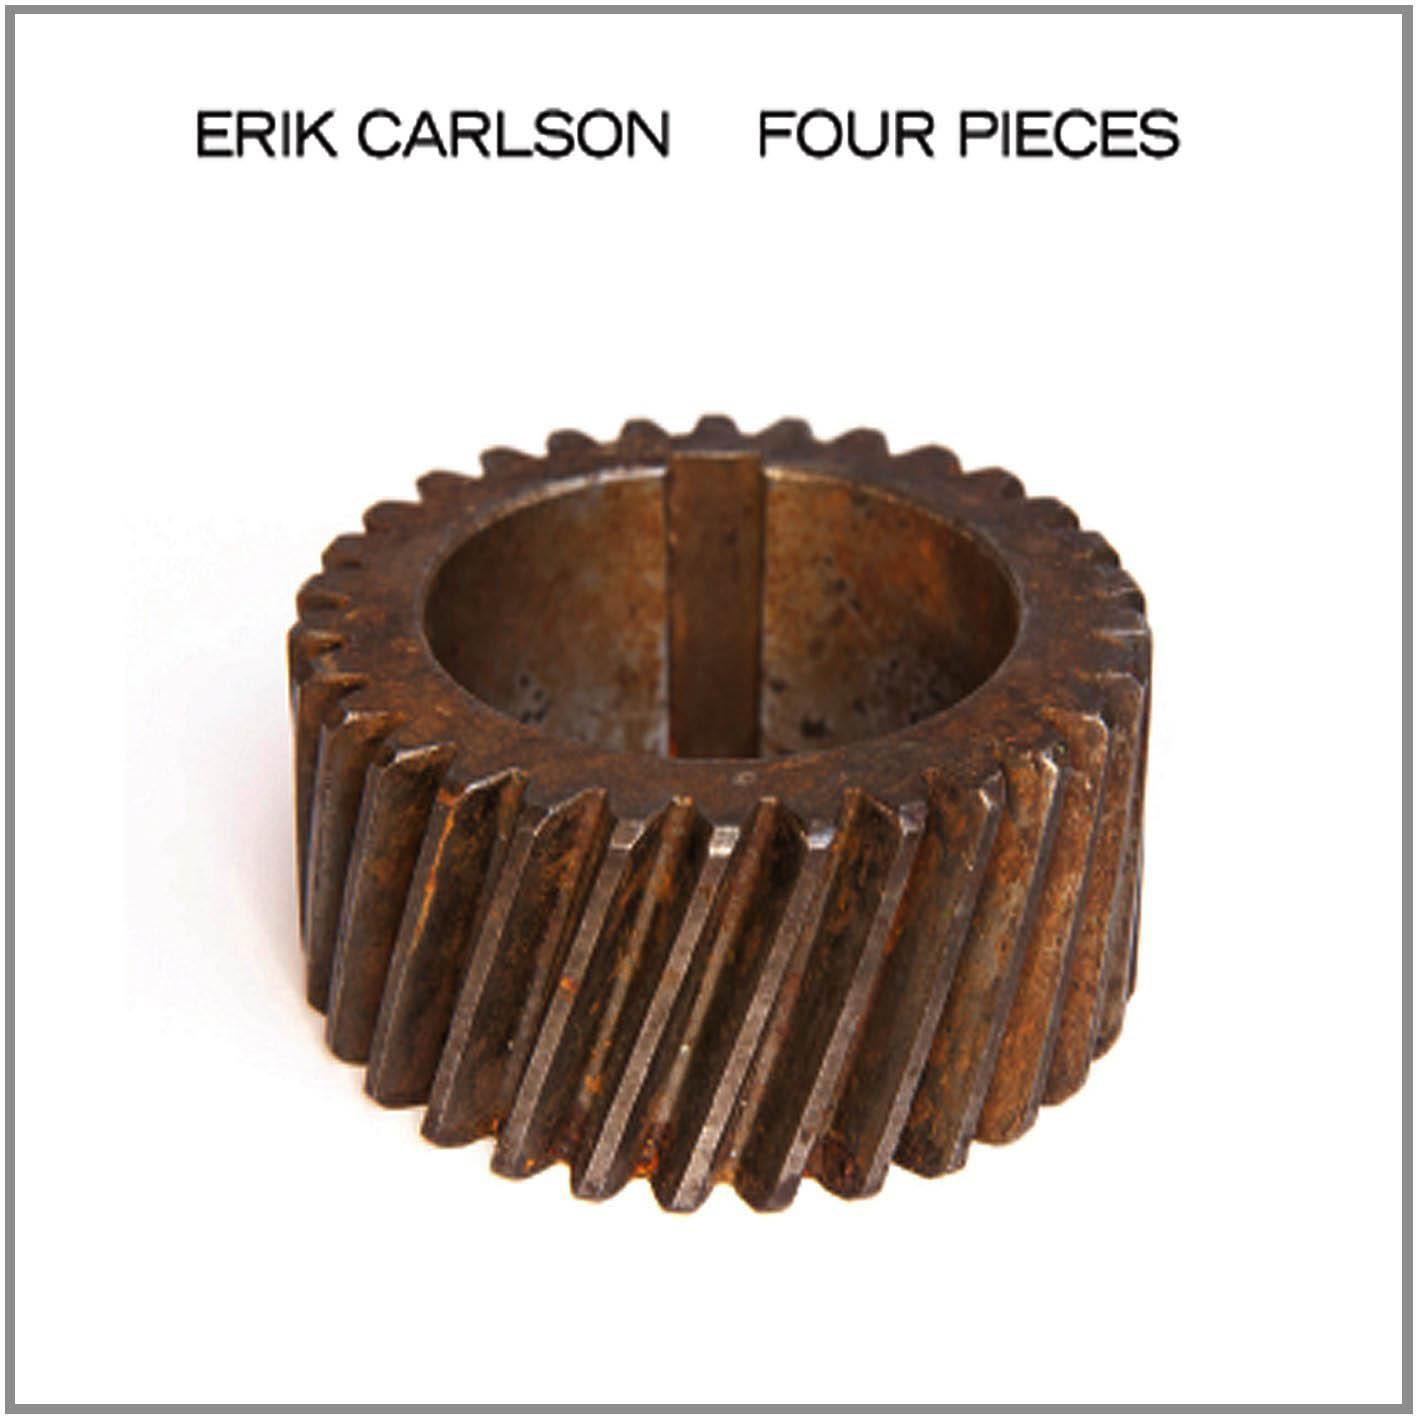 carlson four pieces.jpg